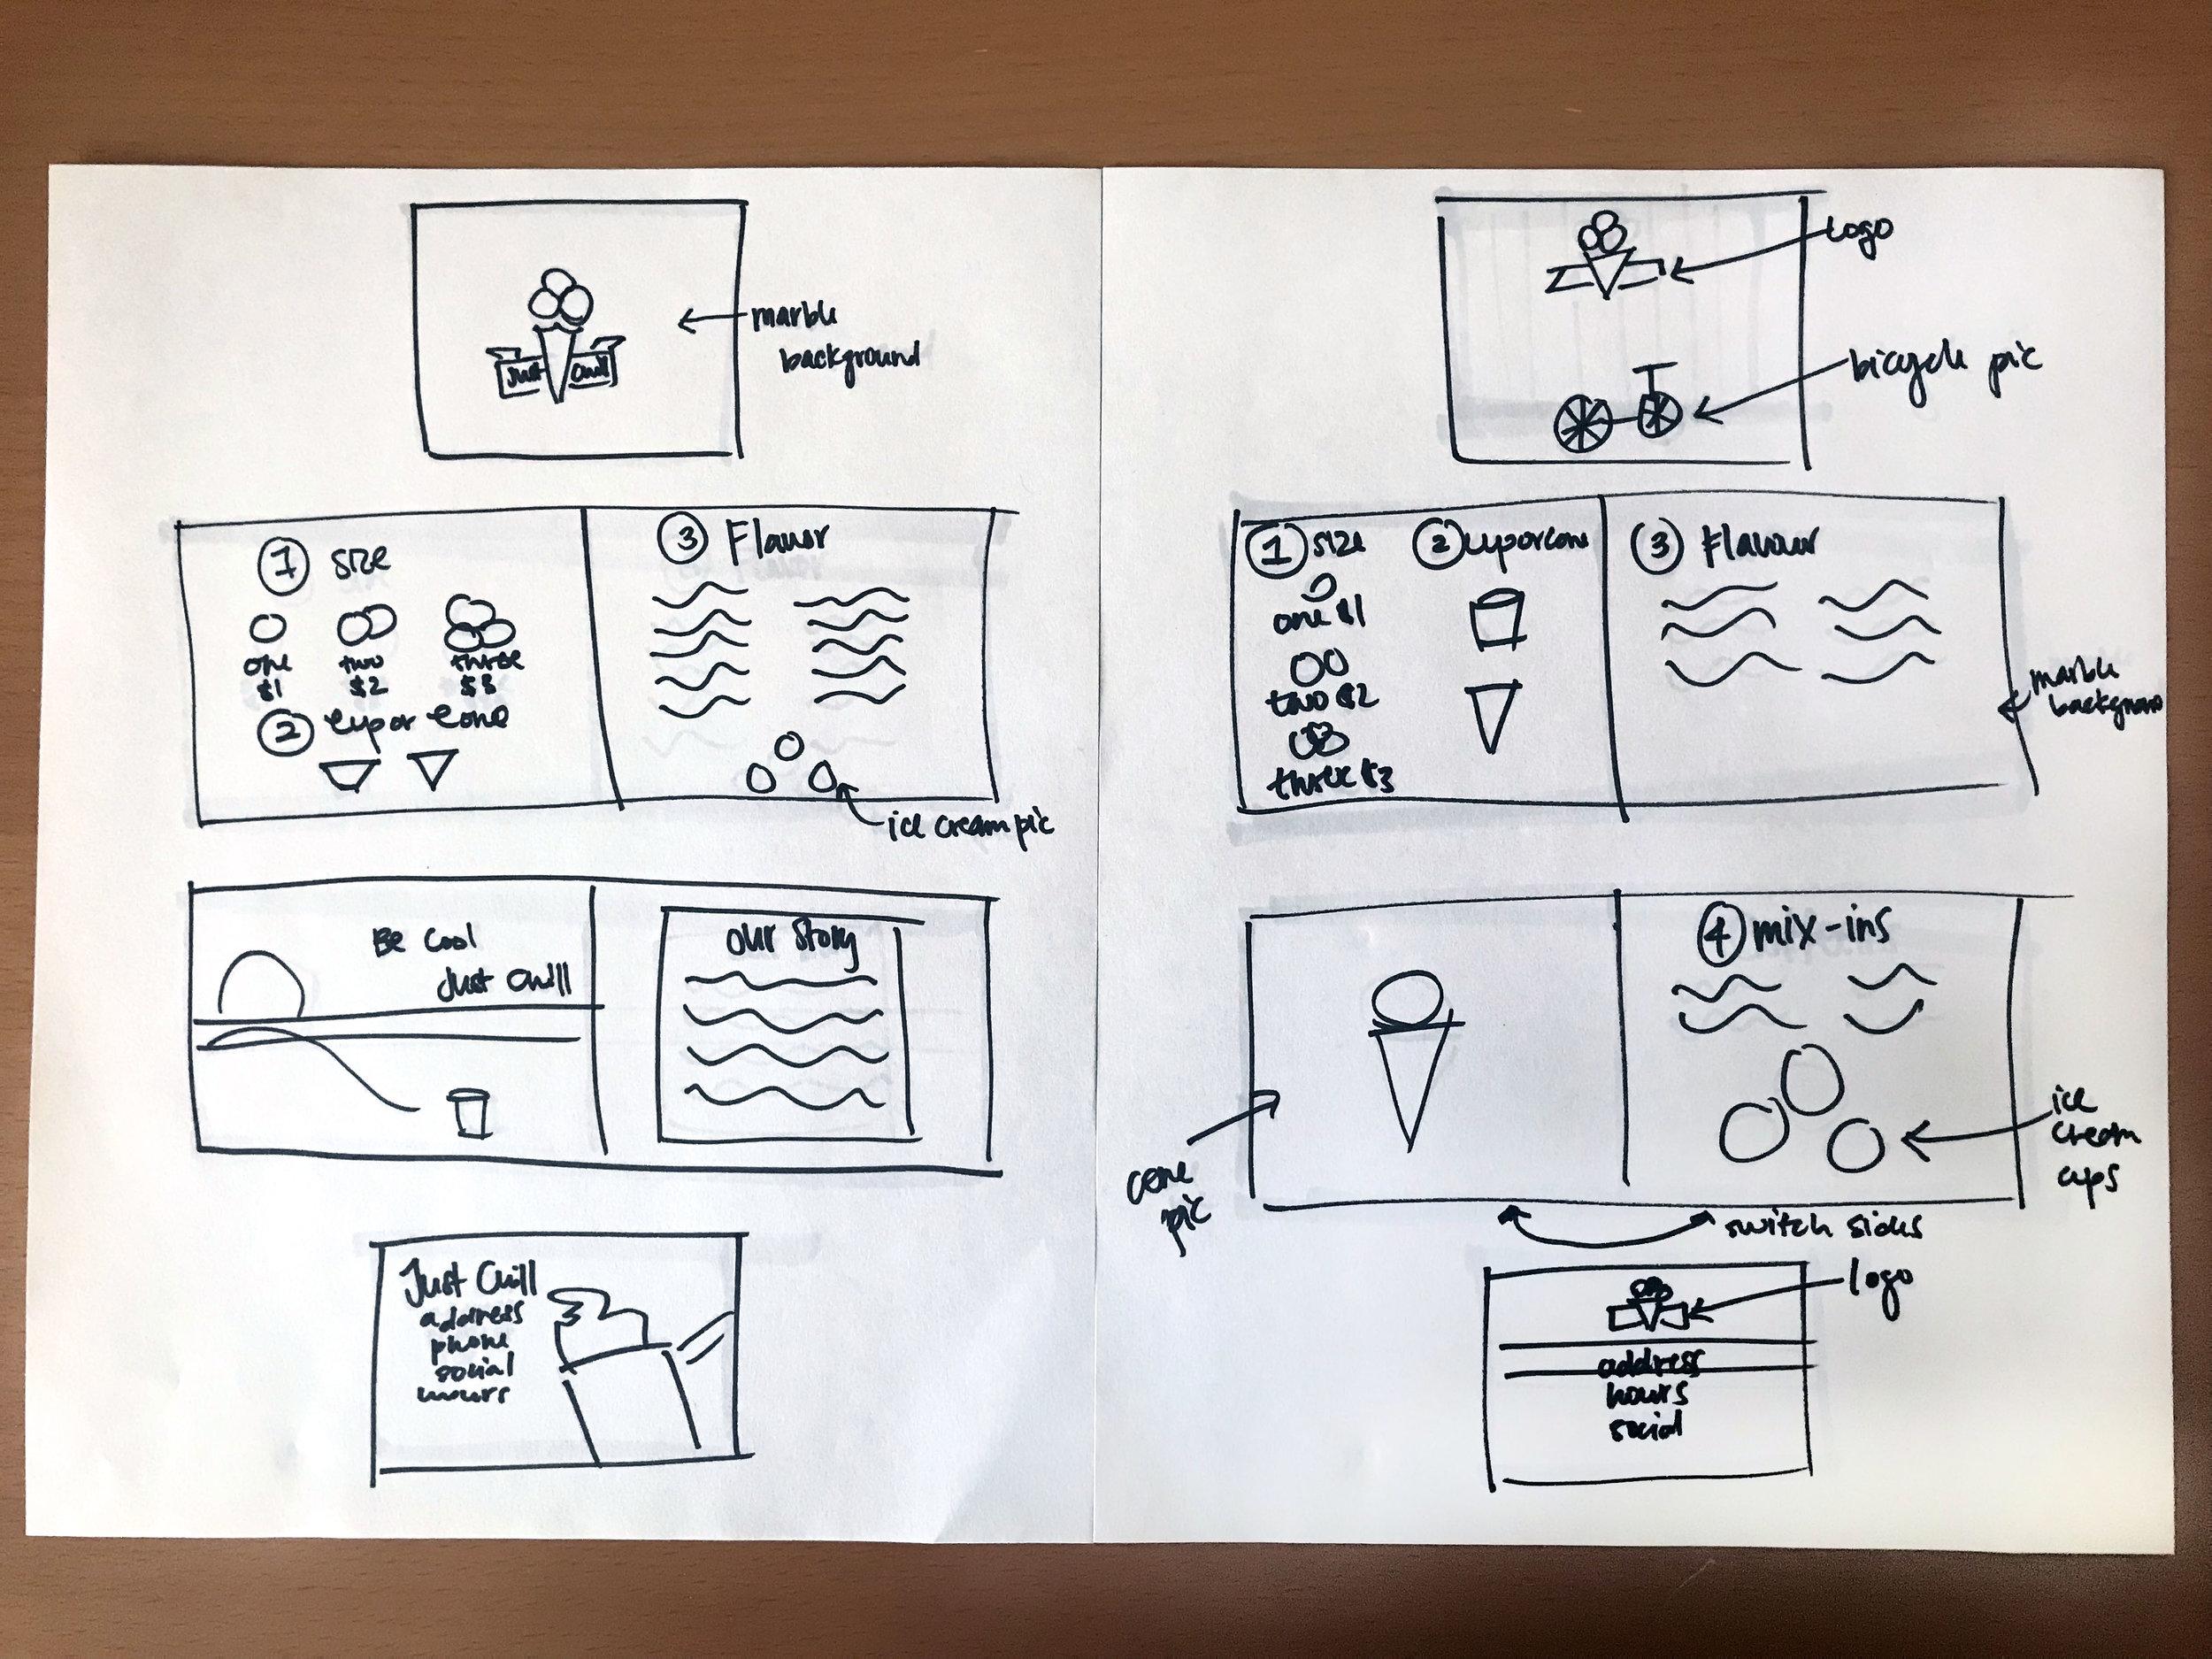 Sketches for the menu design.